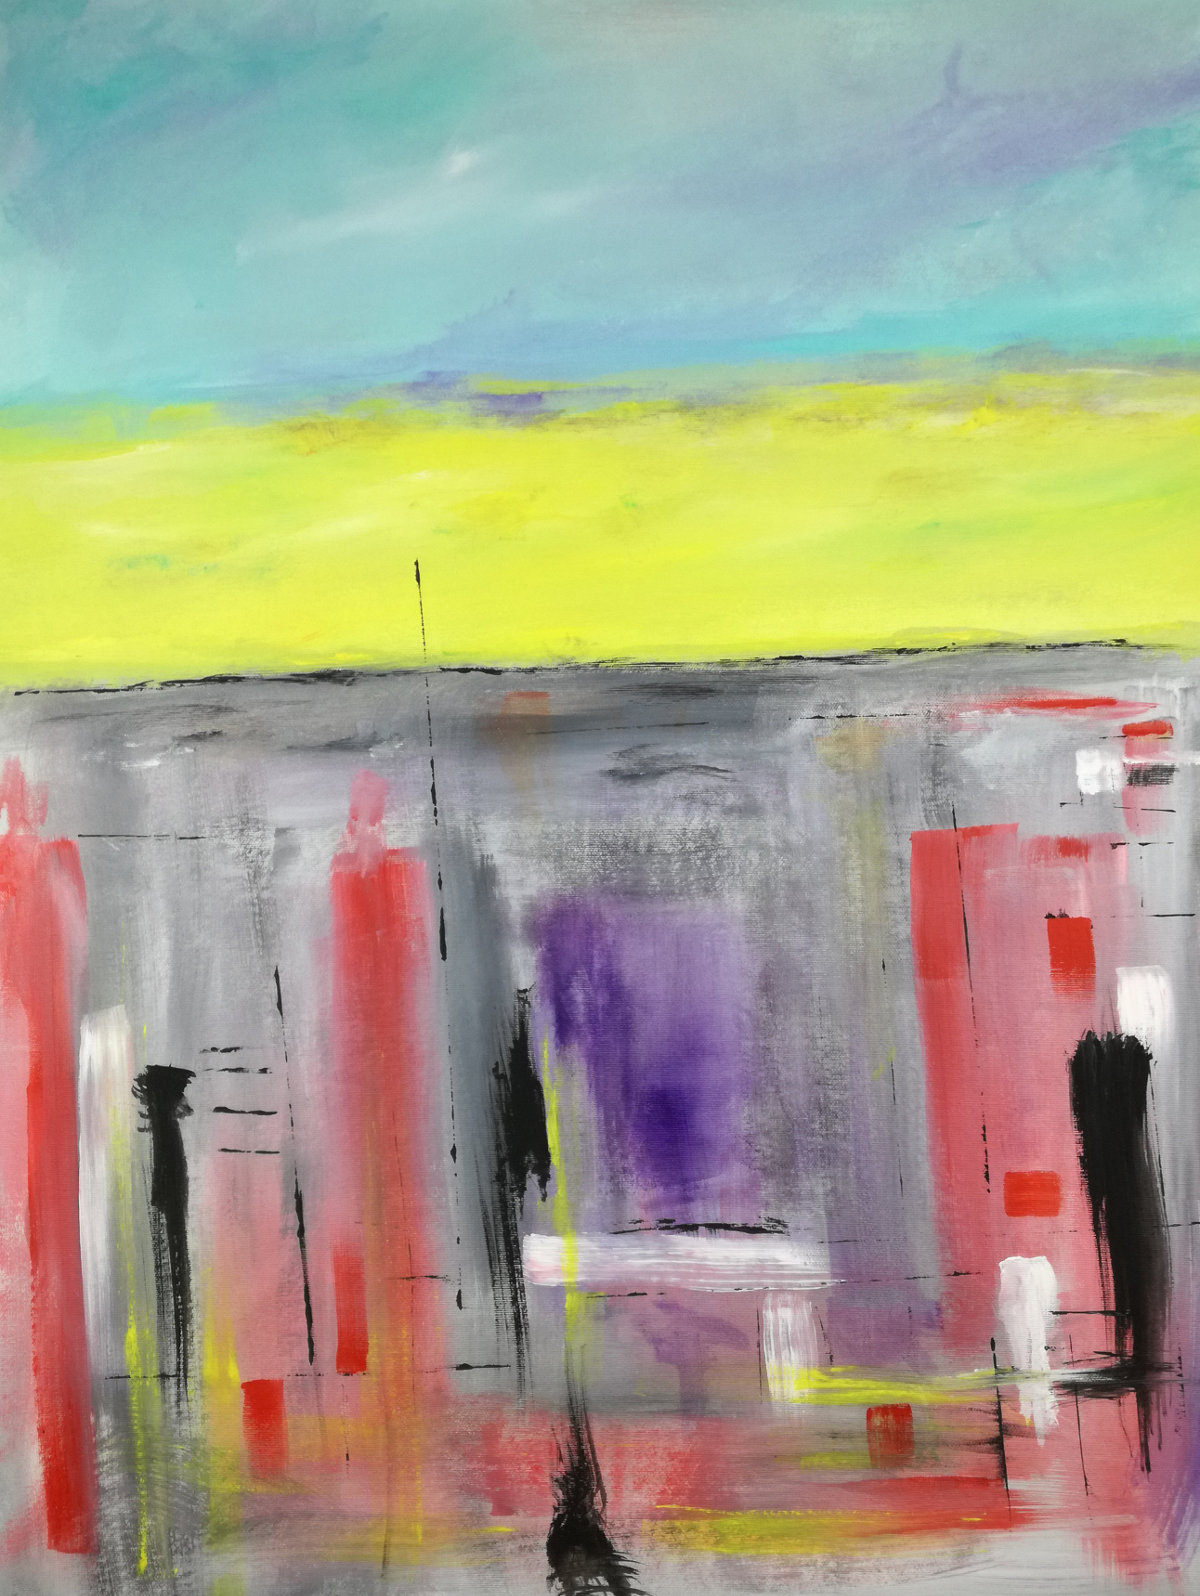 quadri astratti geometrici c065 - dipinti moderni 80x60